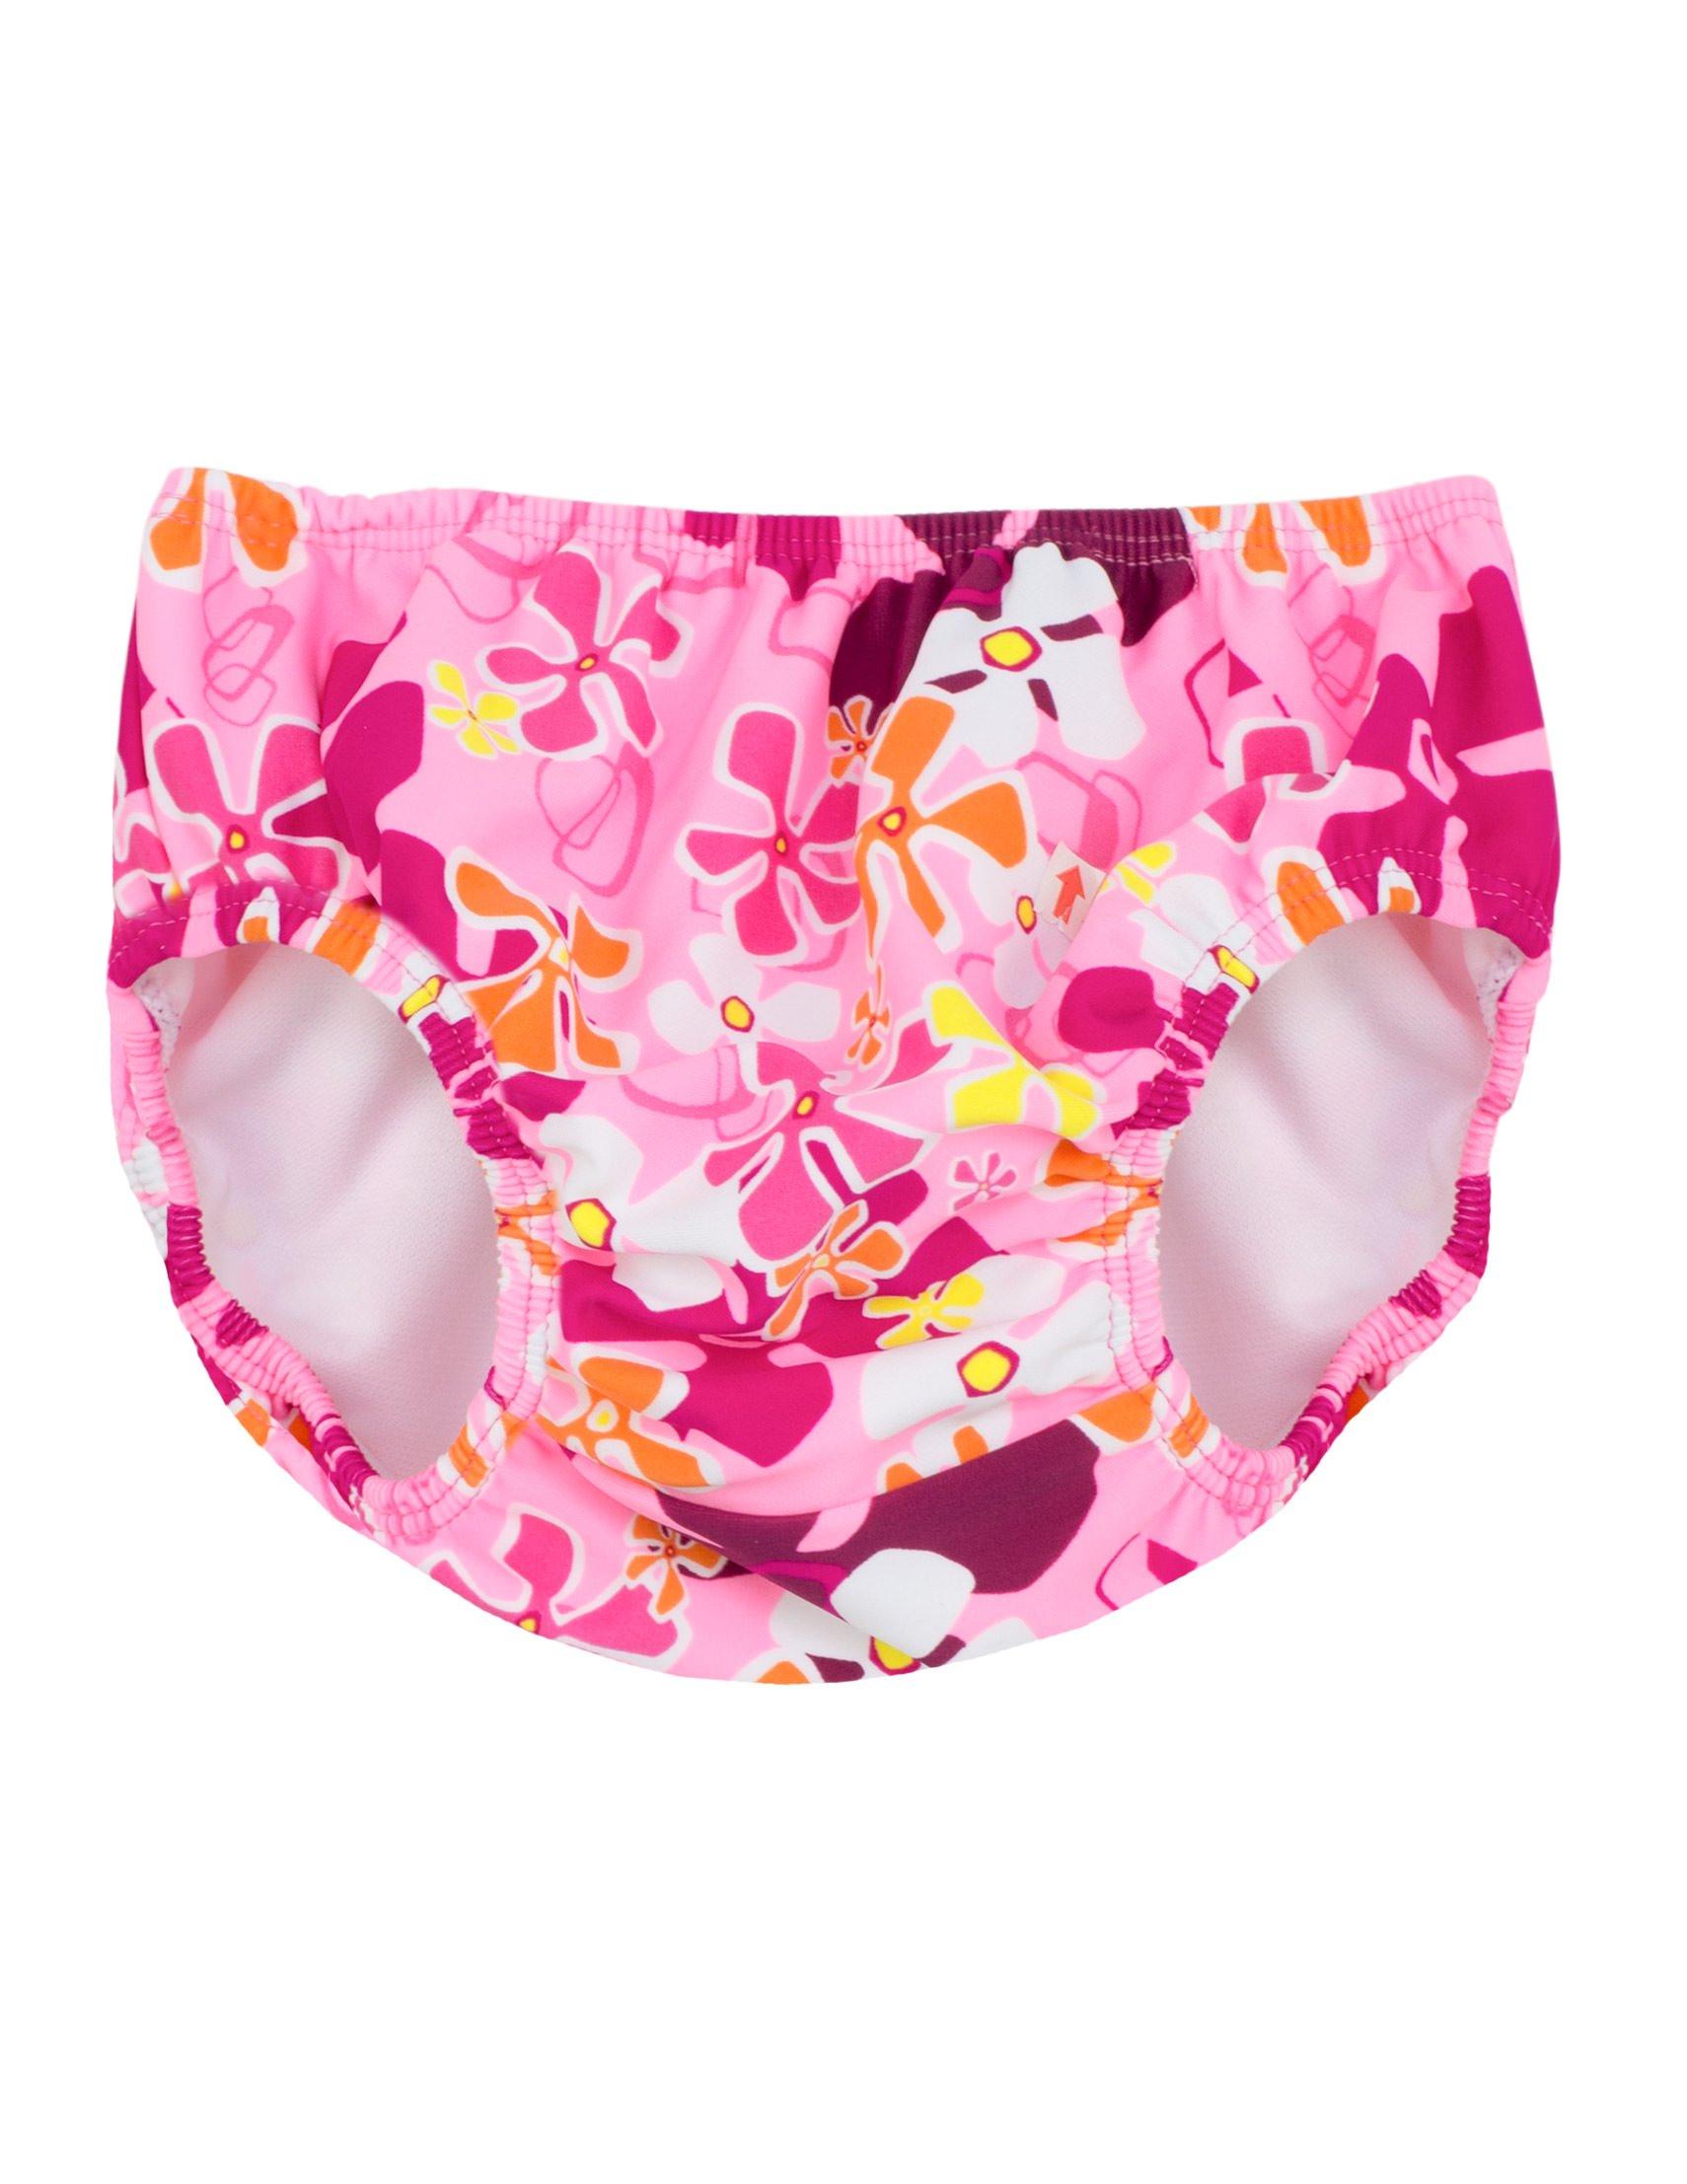 Tuga Girls Reusable Swim Diaper, Misty Pink, M